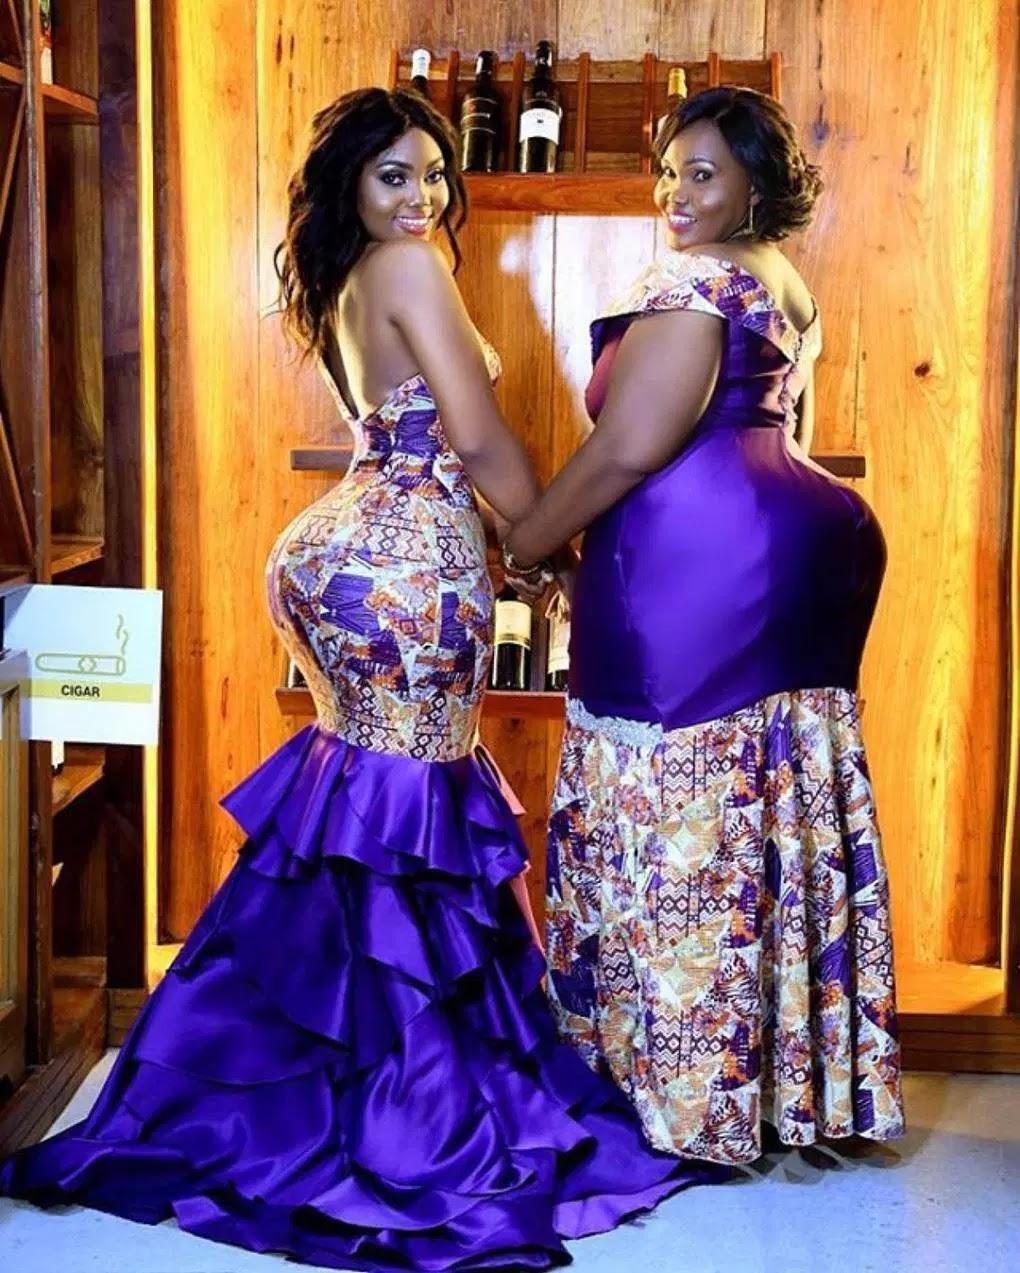 Sanchoka and her Mom